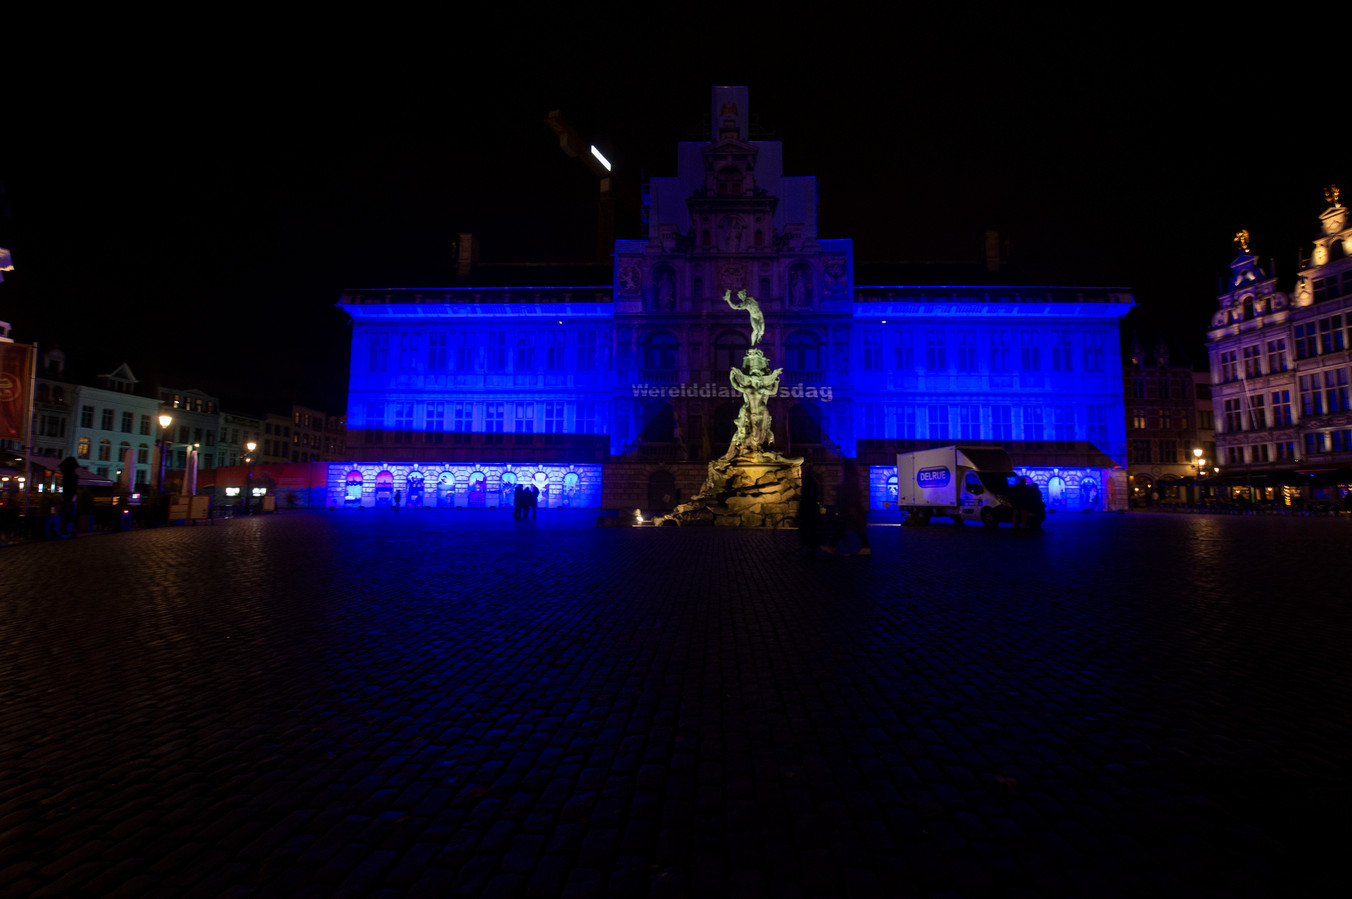 Het stadhuis wordt blauw verlicht.